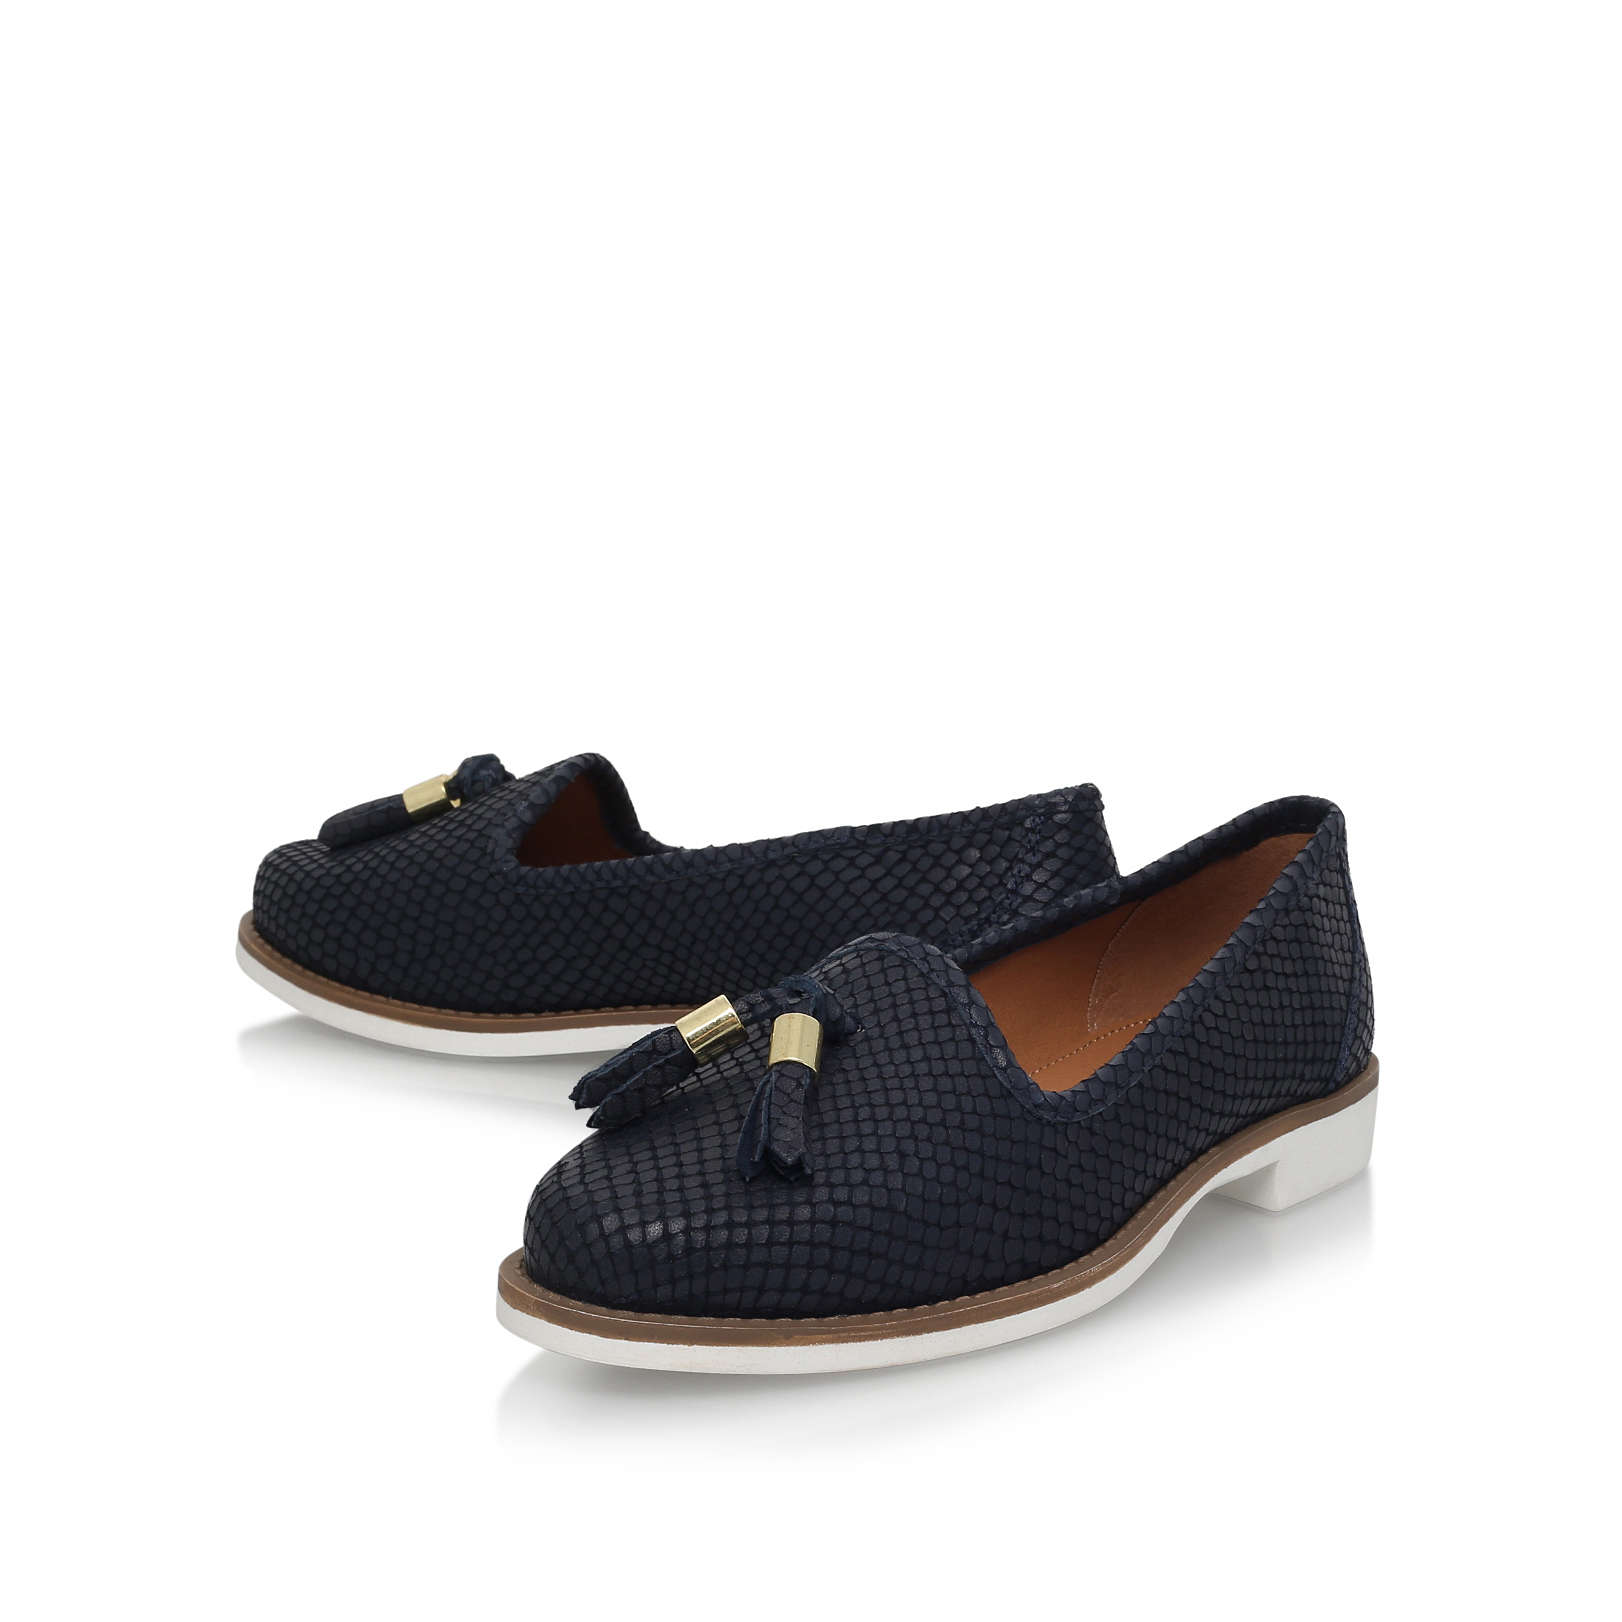 Kurt Geiger Shoes Price